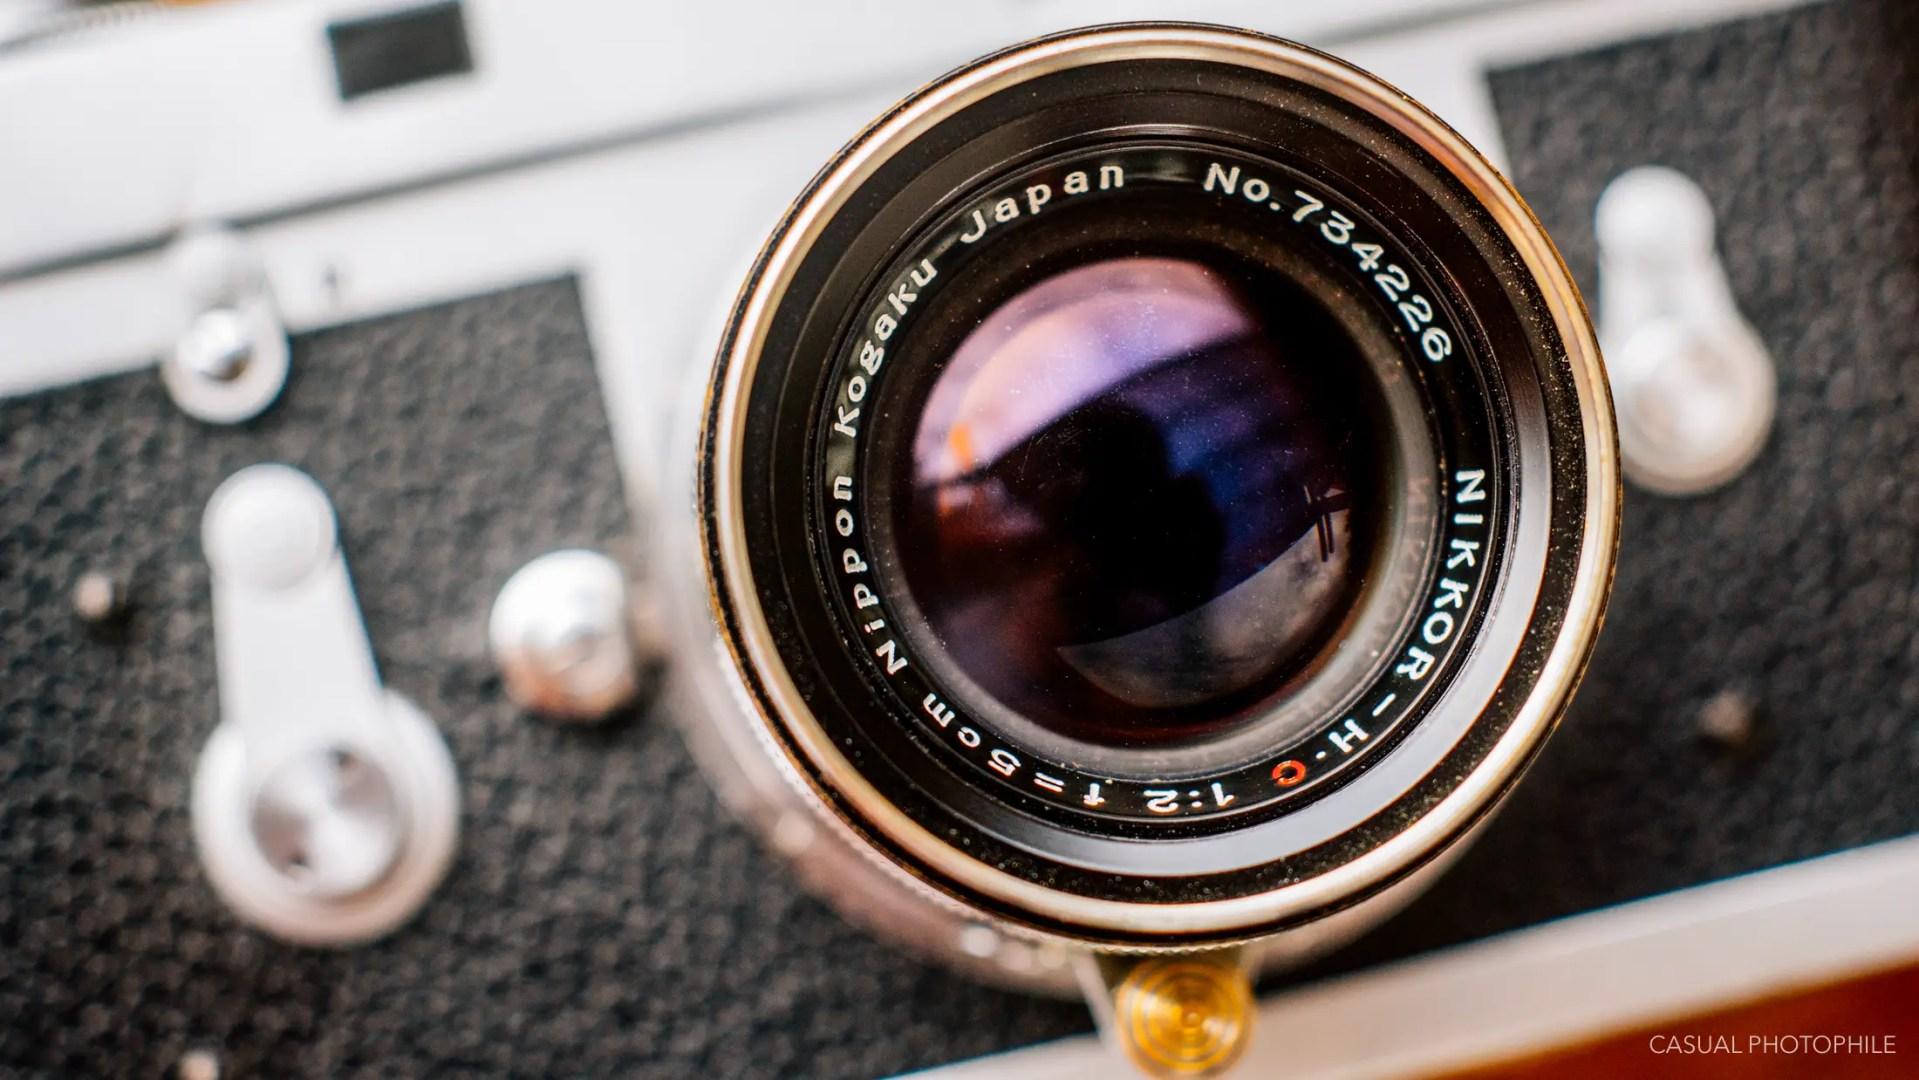 Nikon Nikkor H C 50mm F/2 LTM Lens Review - A Leica